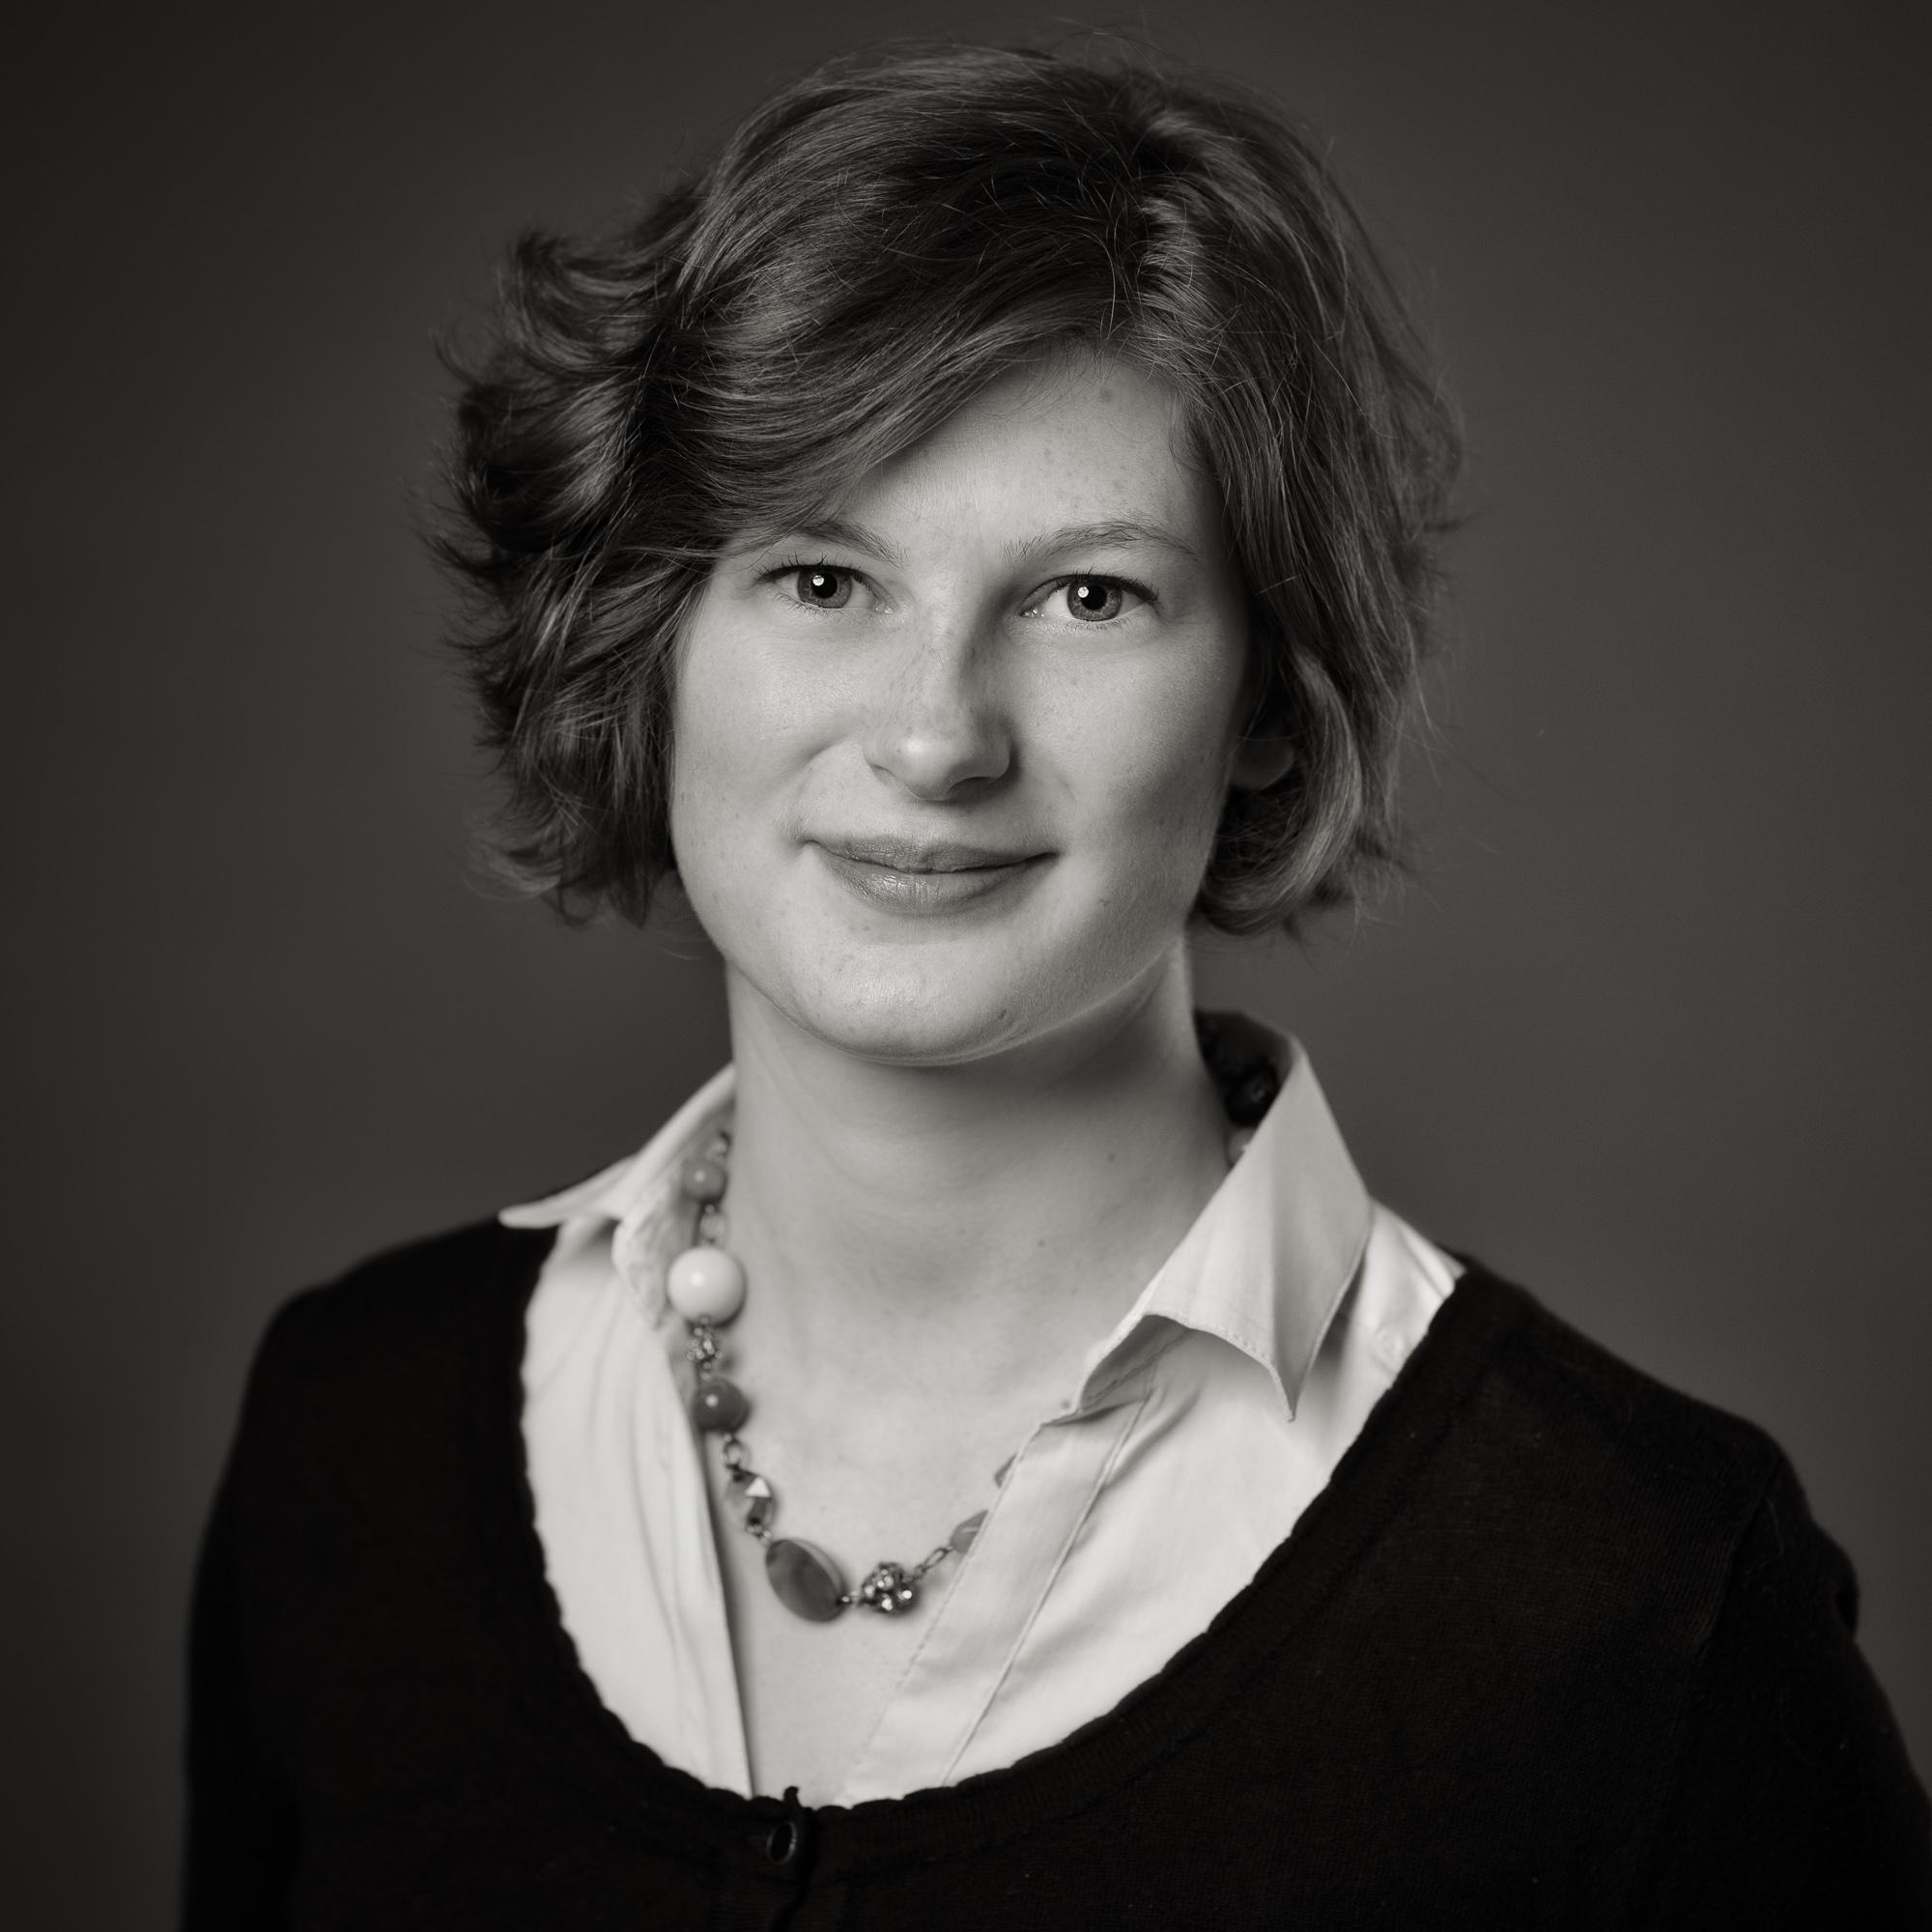 Brigid Farrell